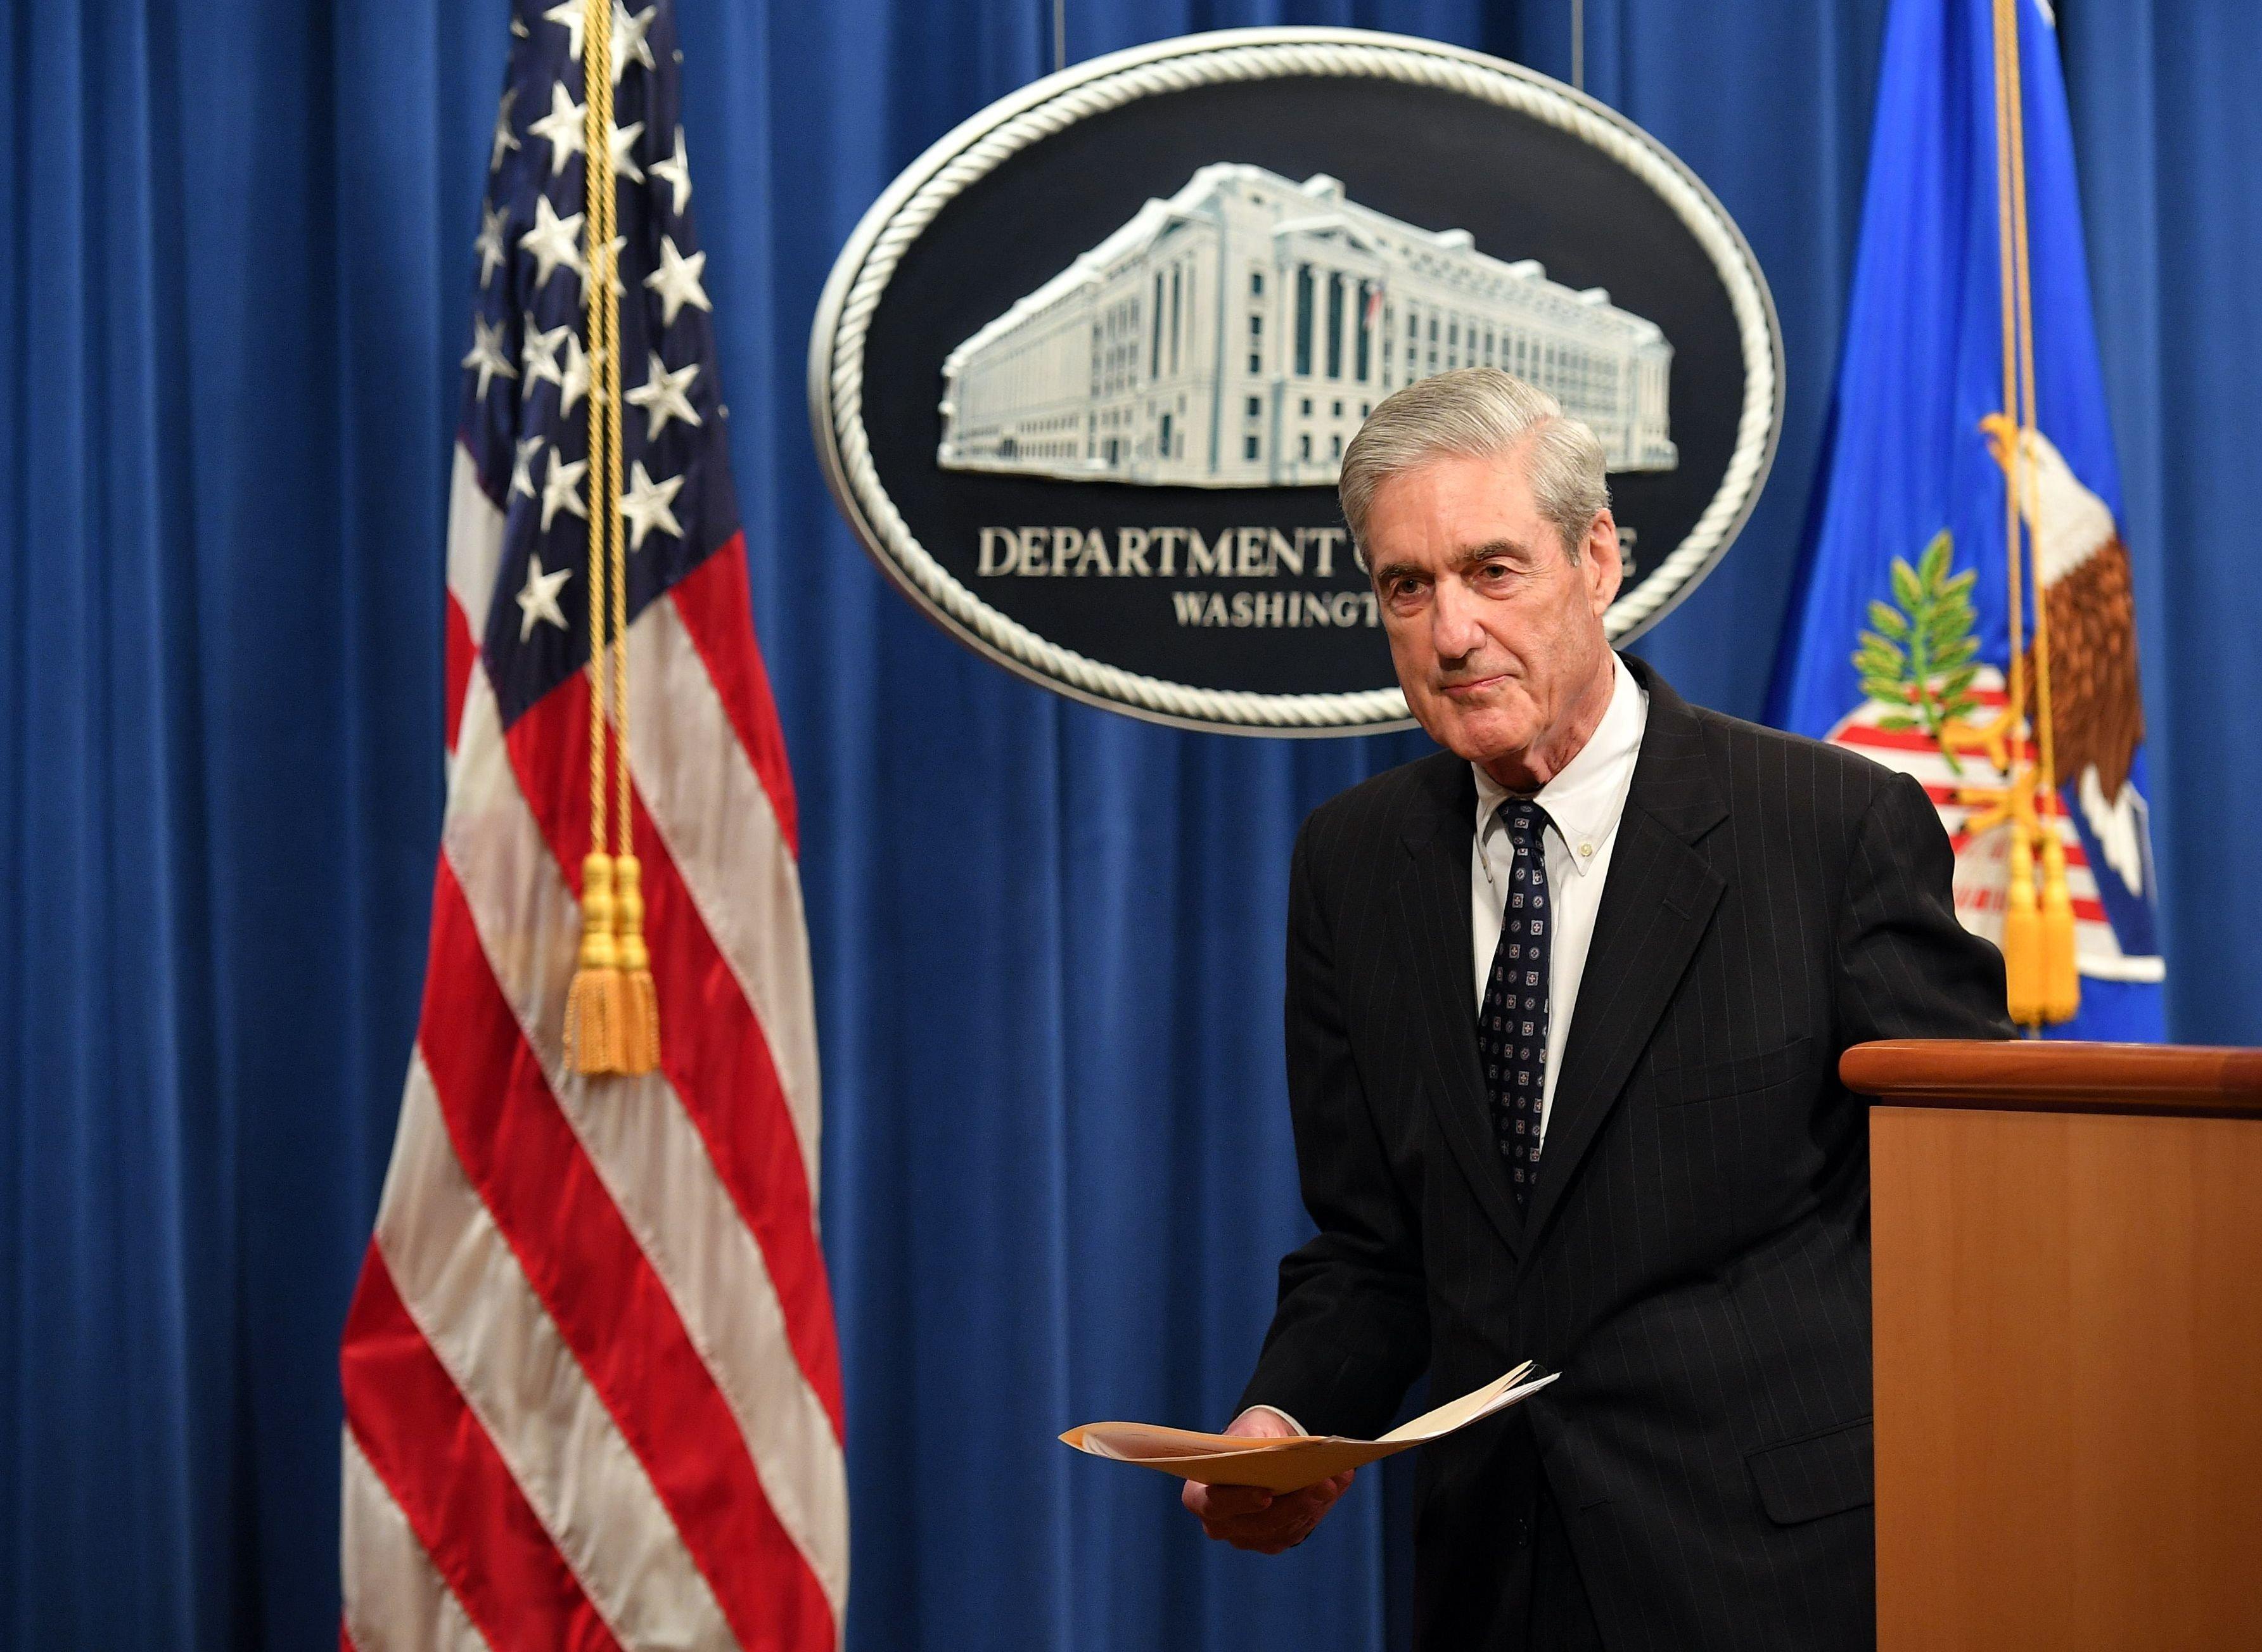 DOJ argues House lawmakers should not gain access to Mueller grand jury materials